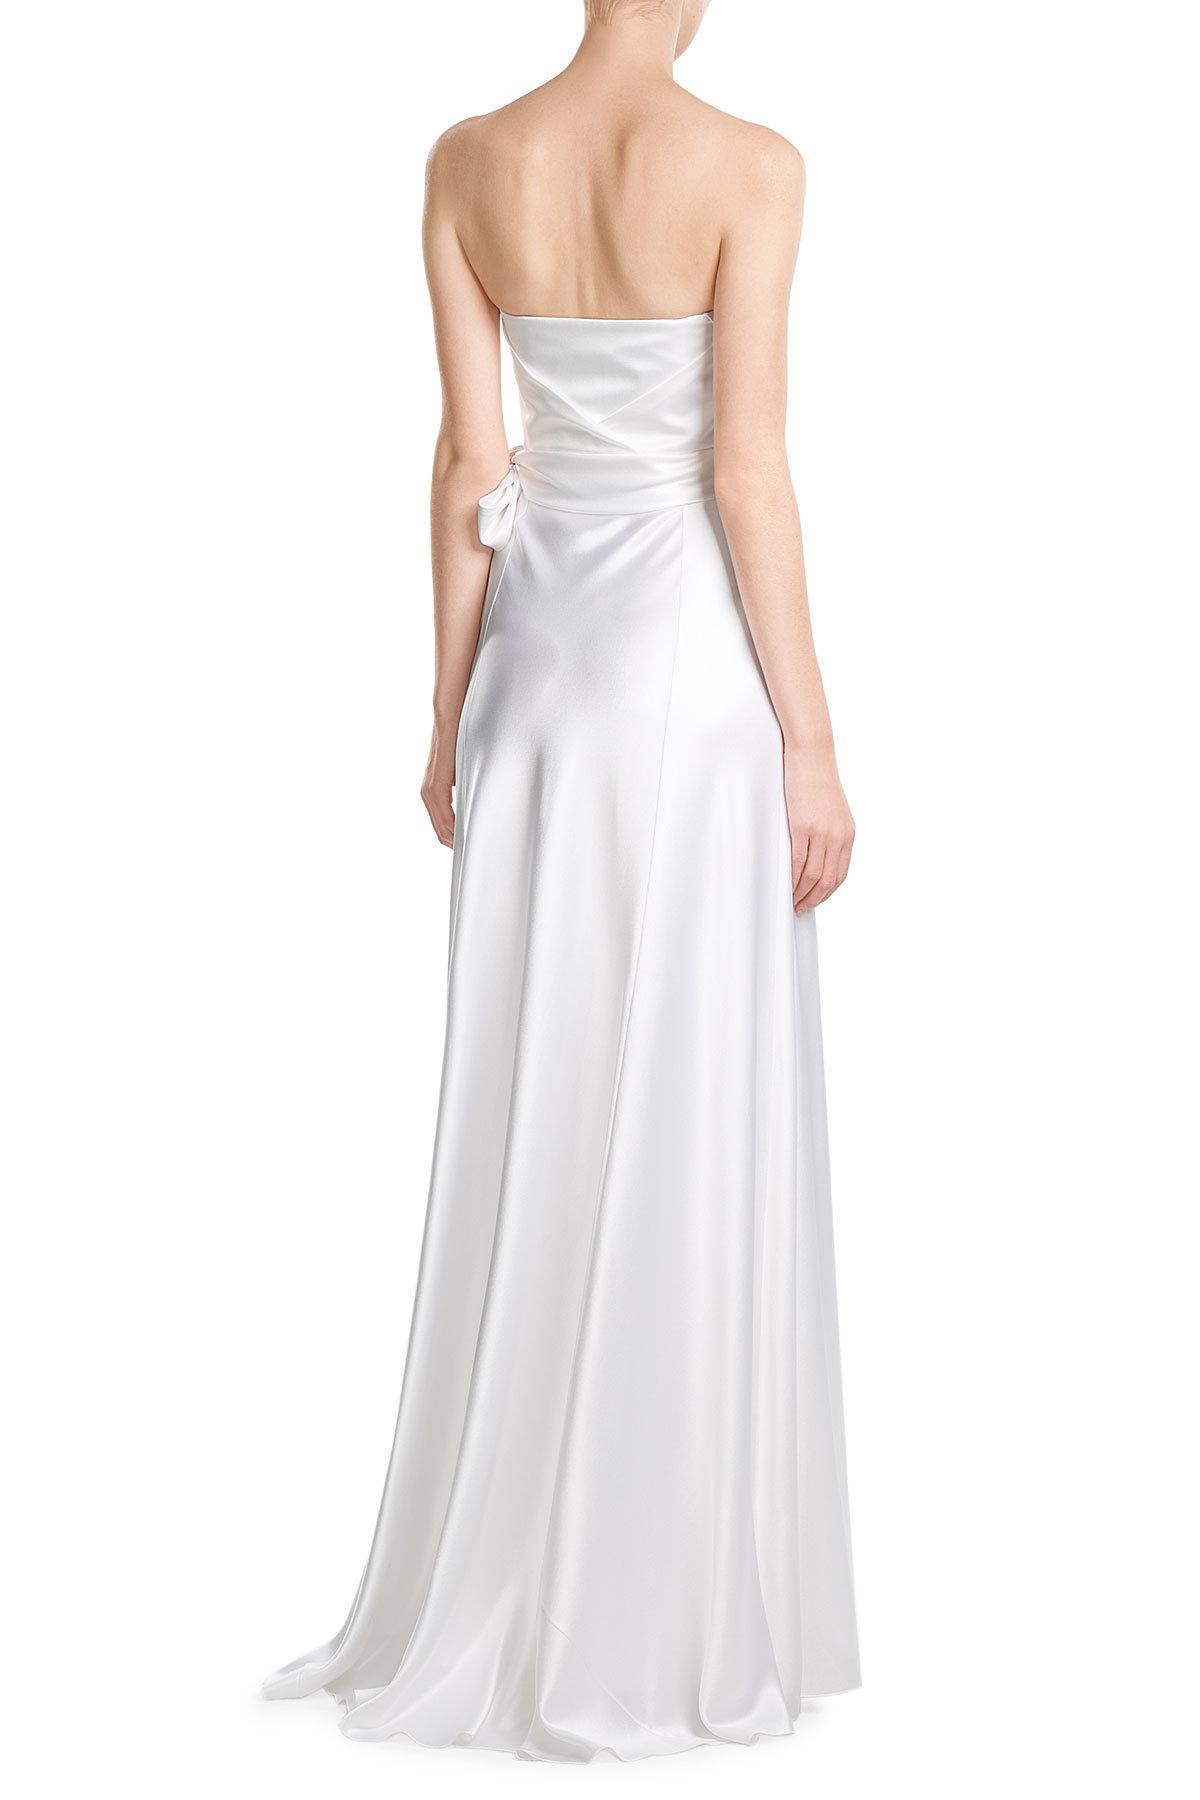 Alberta Ferretti Silk Satin Floor Length Gown In White Lyst